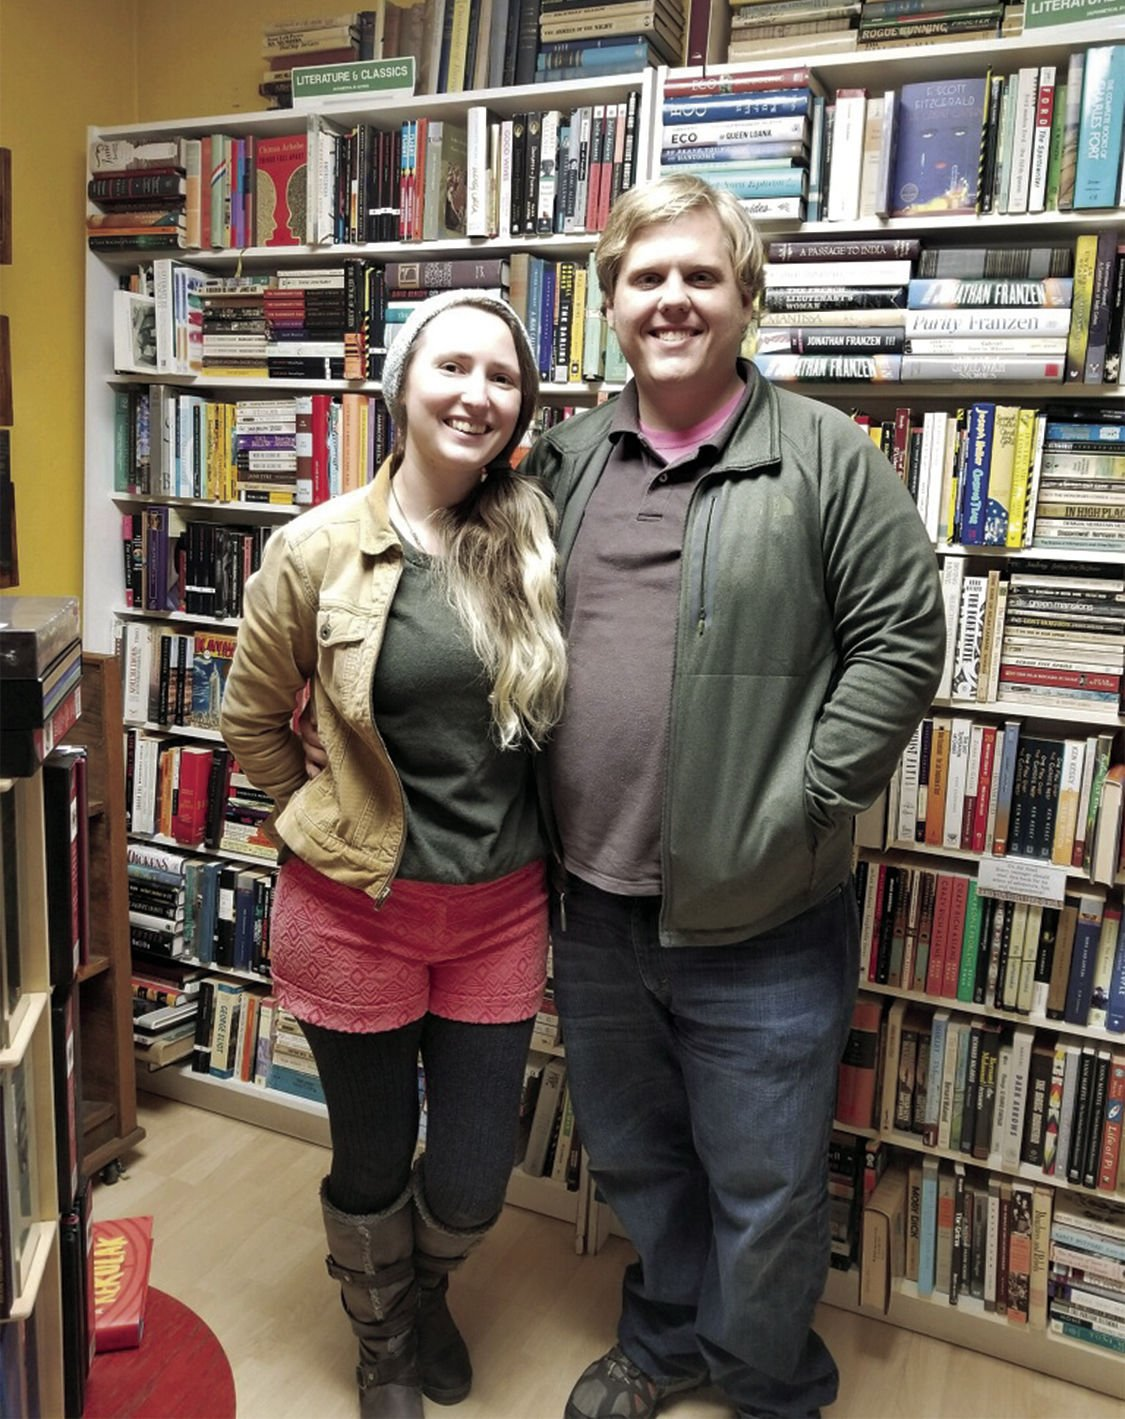 Suburban Reviewers Book Club